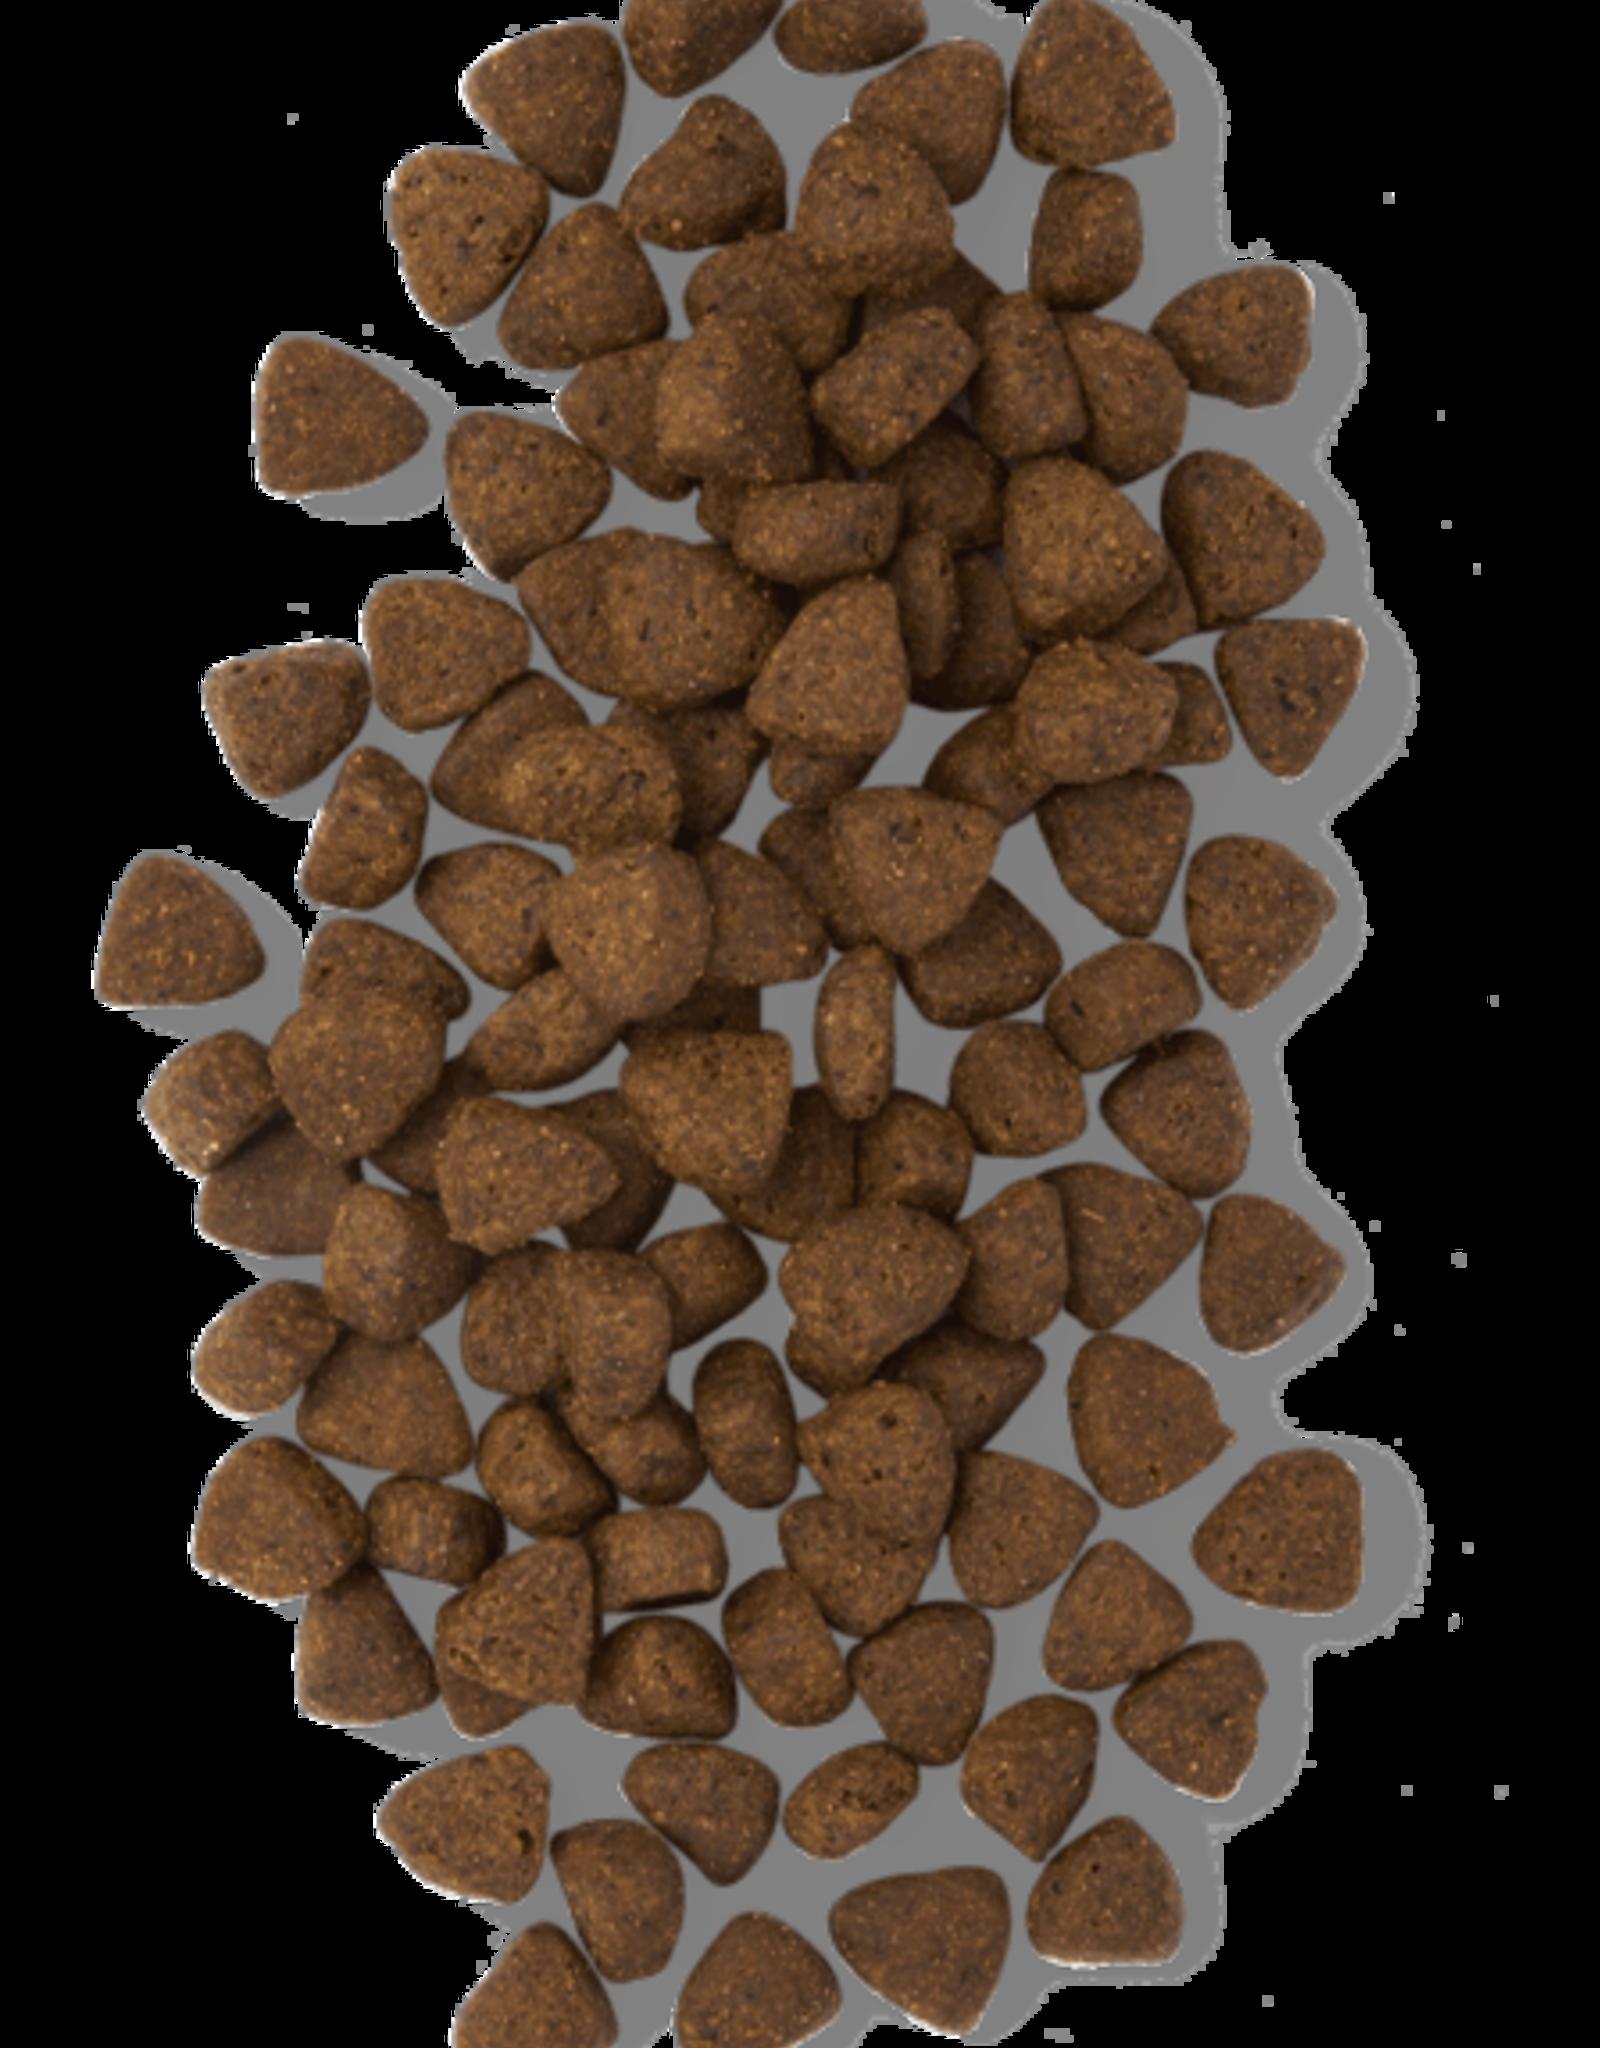 EARTHBORN EARTHBORN DOG UNREFINED ANCIENT GRAINS ROASTED RABBIT 12.5LBS